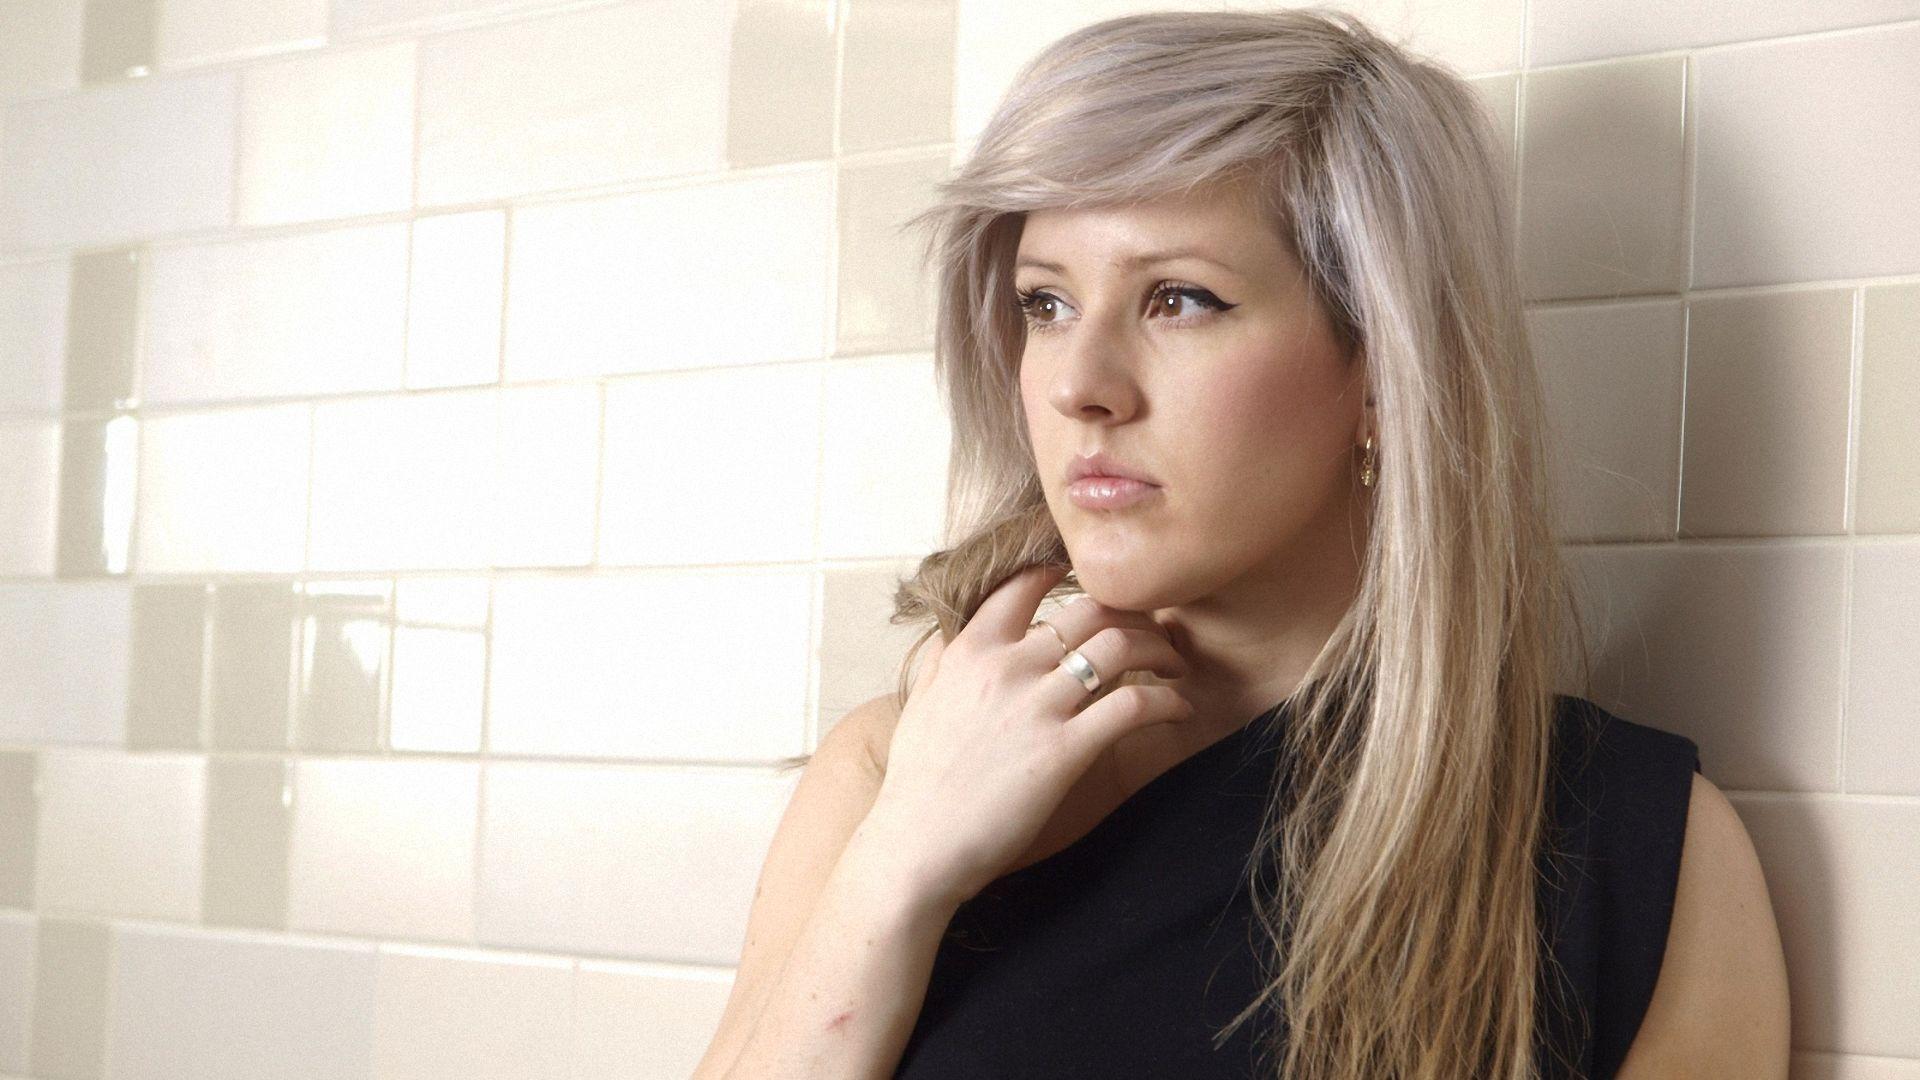 Ellie Goulding, wallpaper, Ellie Goulding hd wallpaper, background .